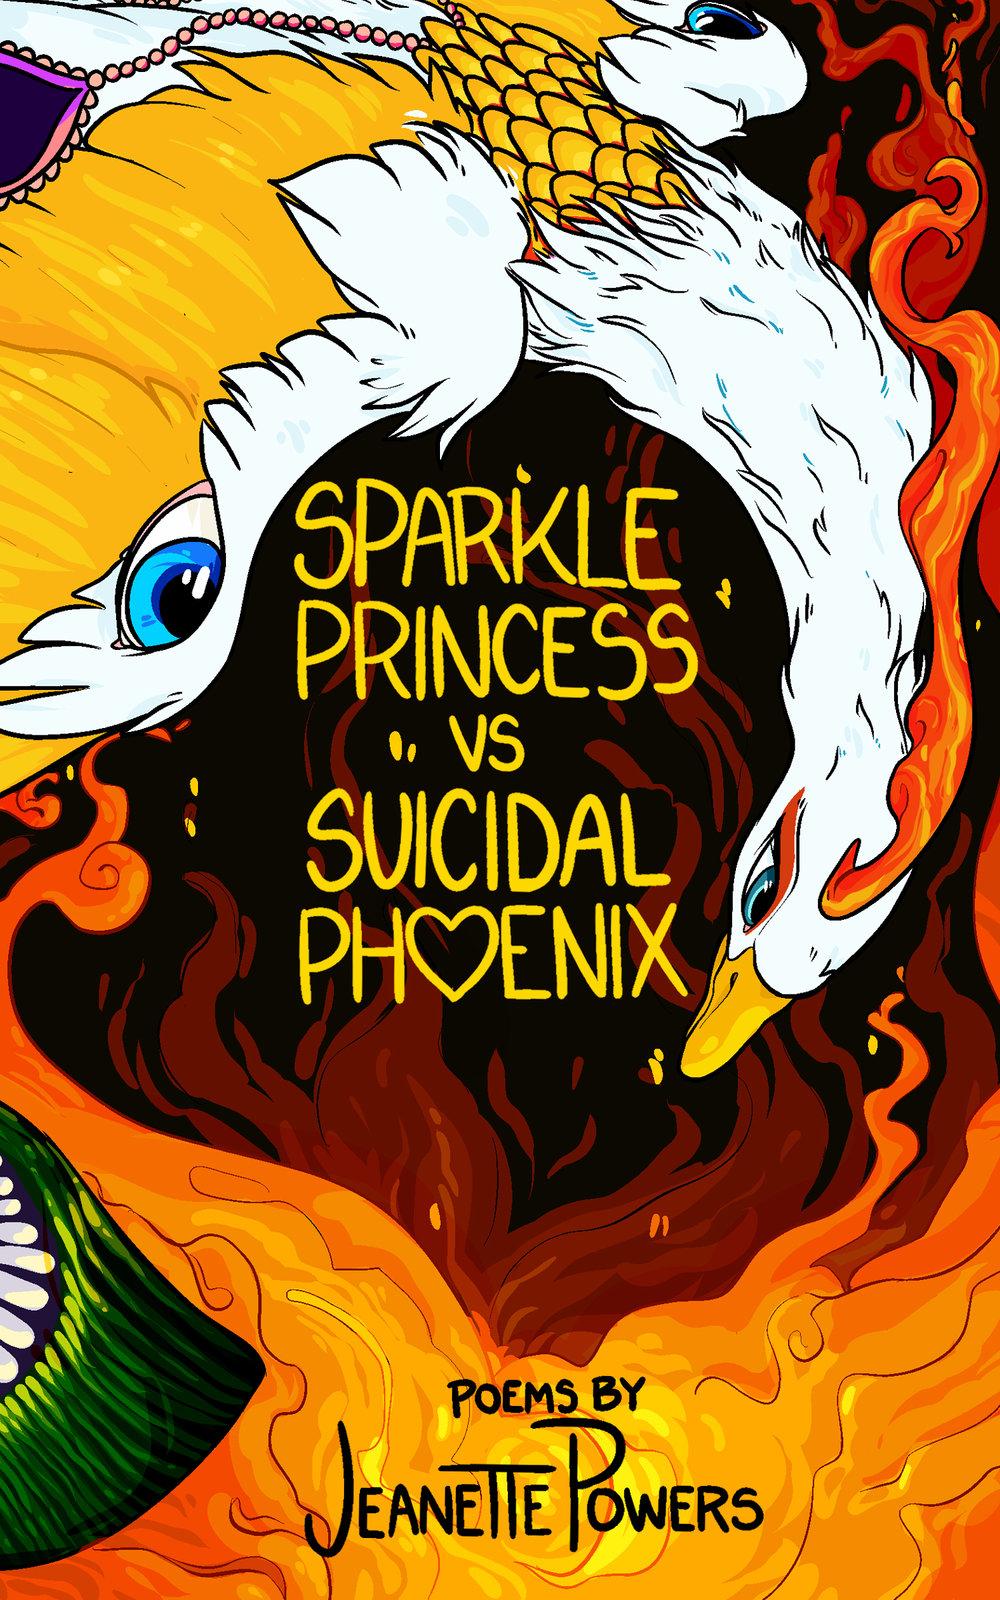 suicidal phoenix2_front.jpg